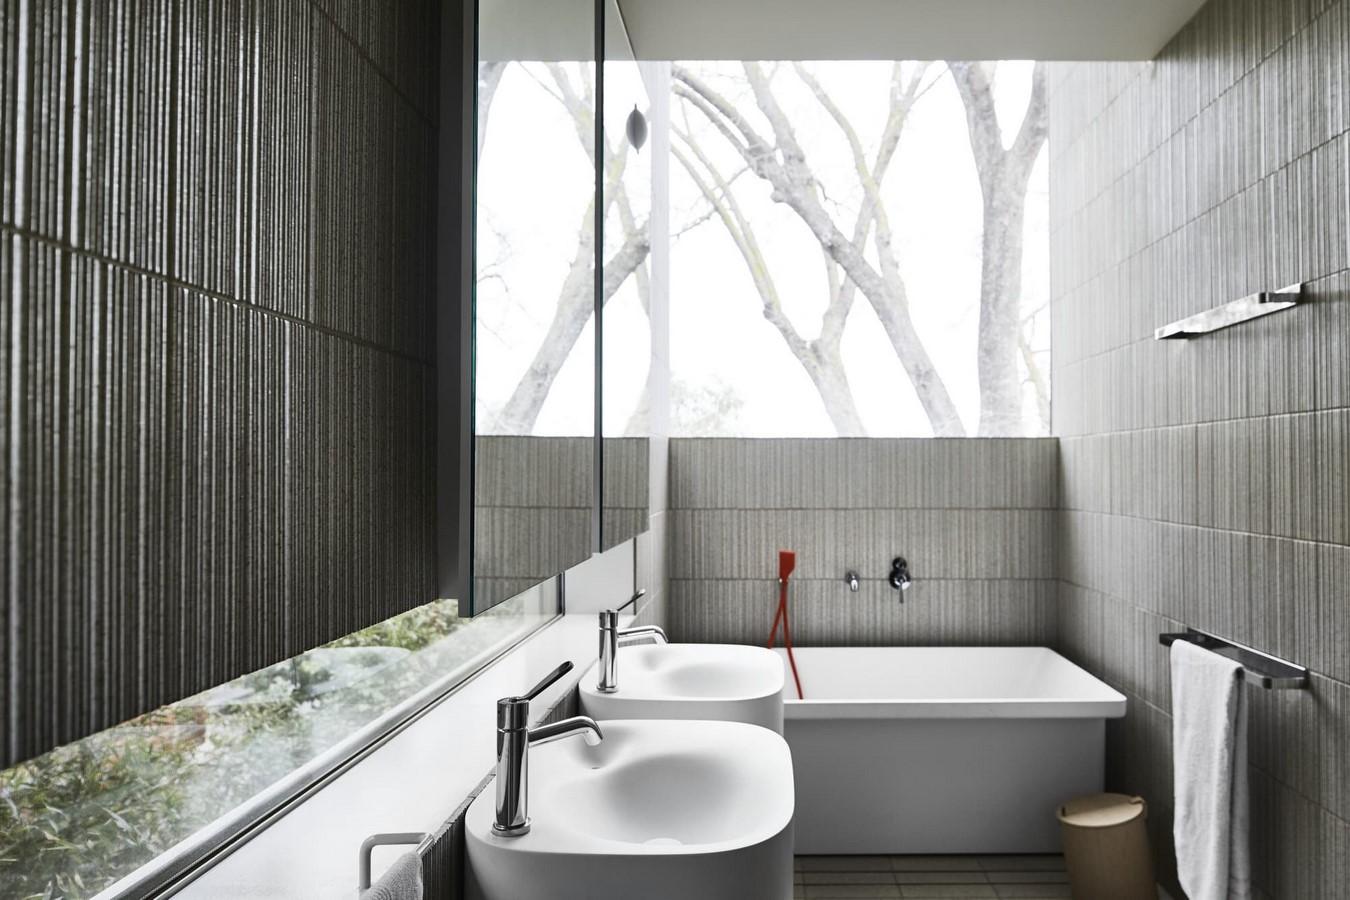 Kew Residence by John Wardle Architects An Australian Modern House - Sheet10